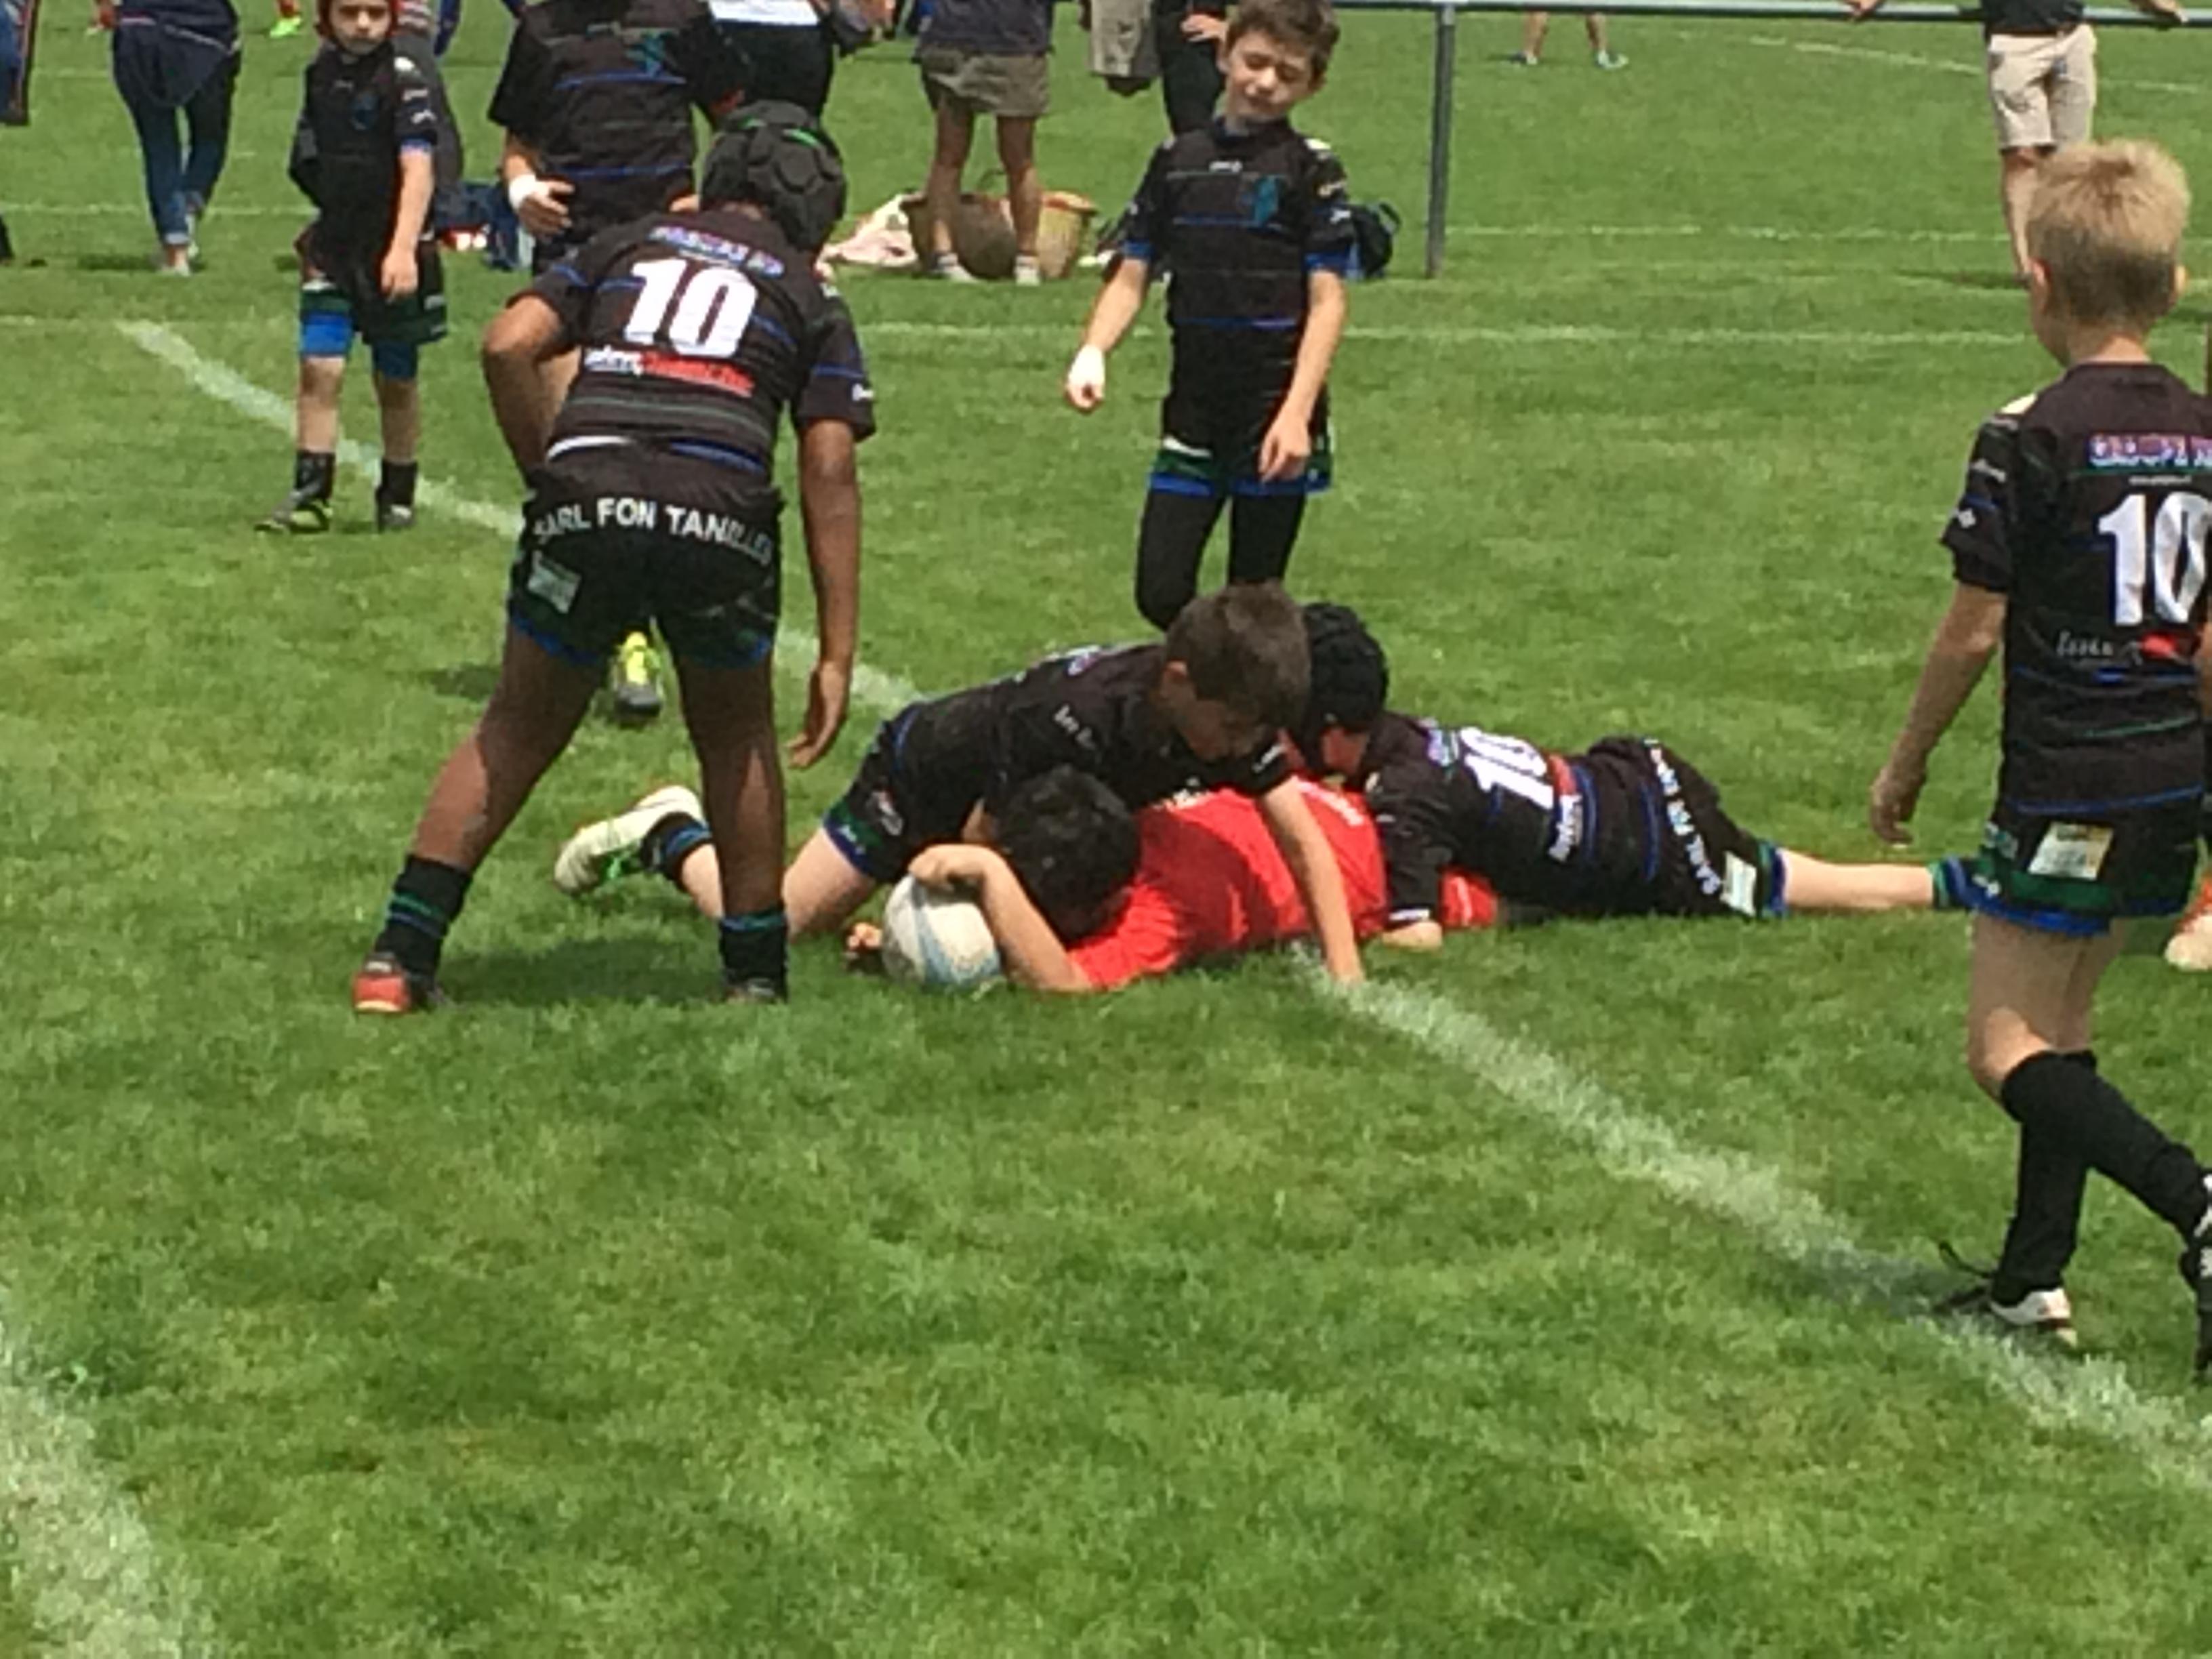 http://scg-rugby.com/wp-content/uploads/2018/06/U102.jpg